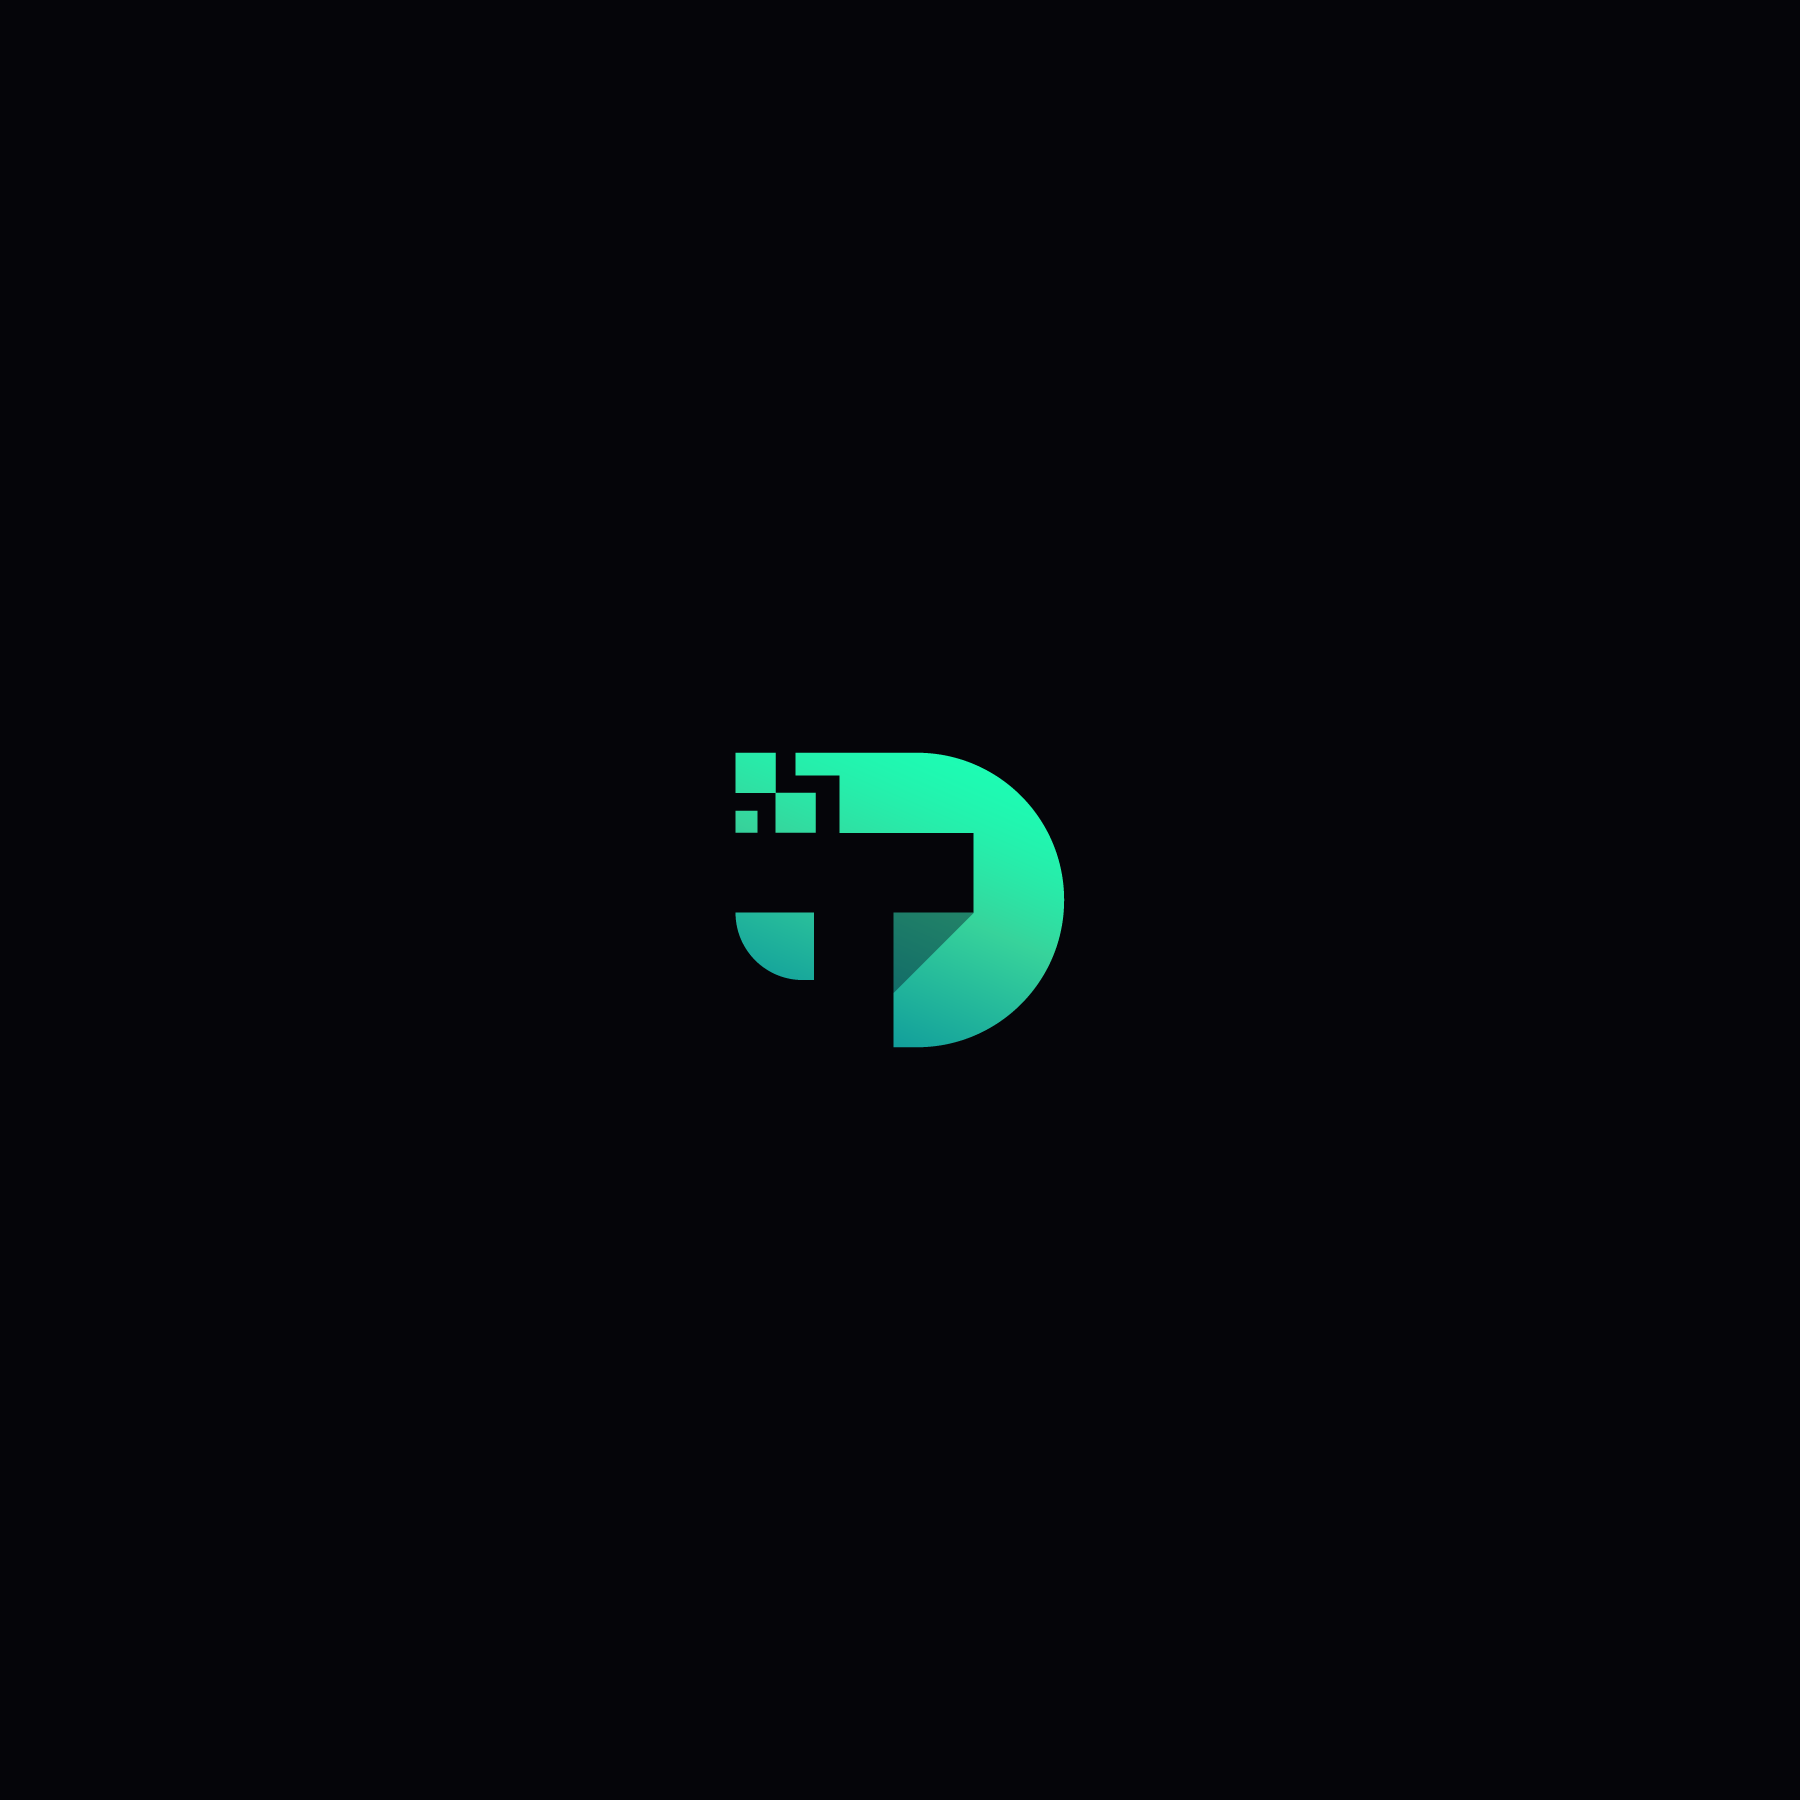 Technology Icon/word logo